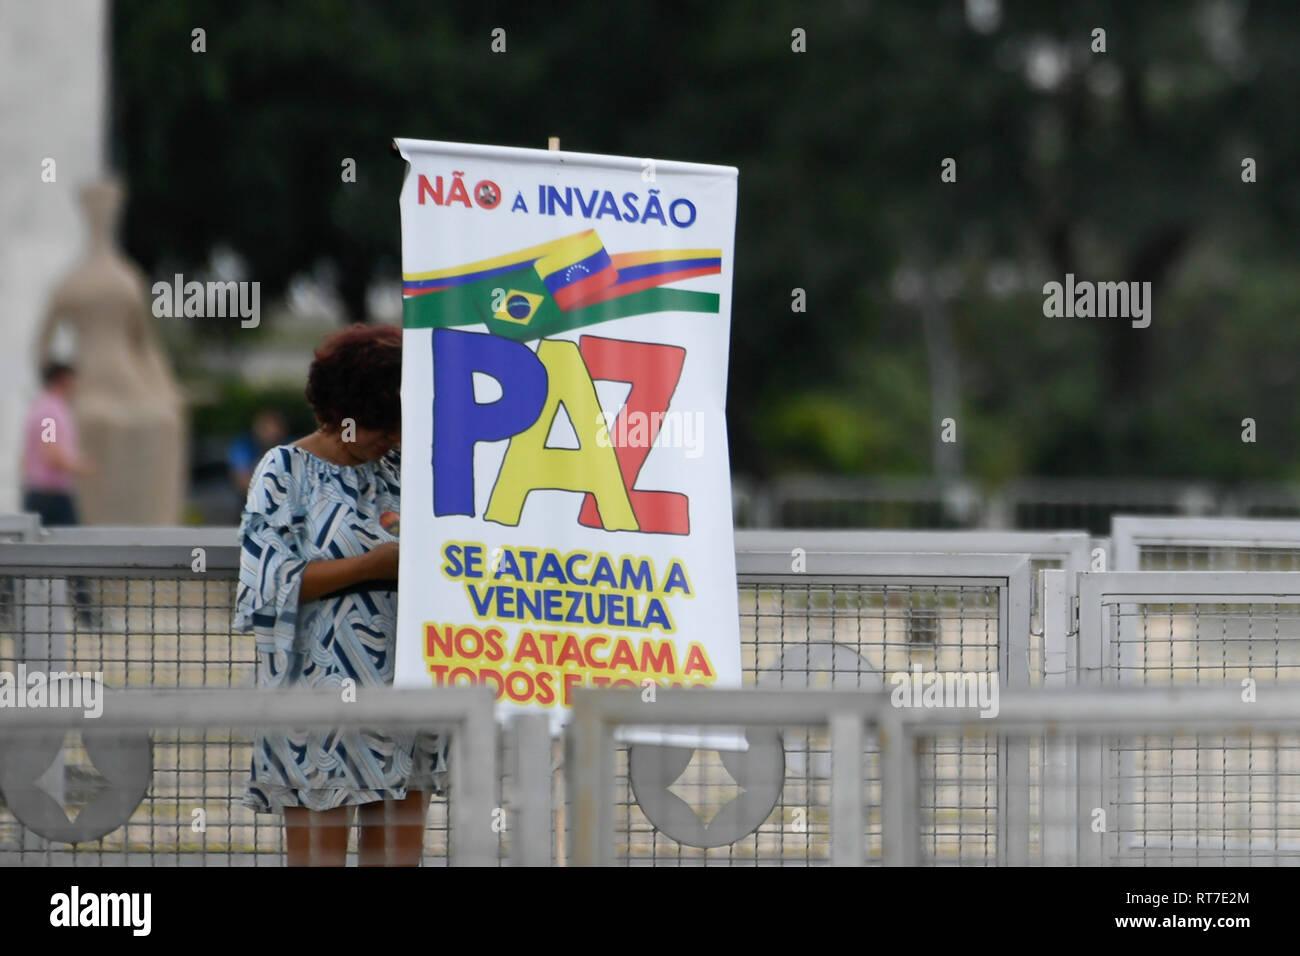 Brasilia, Brazil. 28th Feb, 2019. DF - Brasilia - 02/28/2019 - Visit Juan Guaido to Brasilia - Protesters in favor of the government of Nicolas Maduro, President of Venezuela, on Thursday, February 28, protest against Juan Guaido, self-proclaimed interim president of Venezuela. near the pallium of the plateau. Photo: Mateus Bonomi/AGIF Credit: AGIF/Alamy Live News - Stock Image